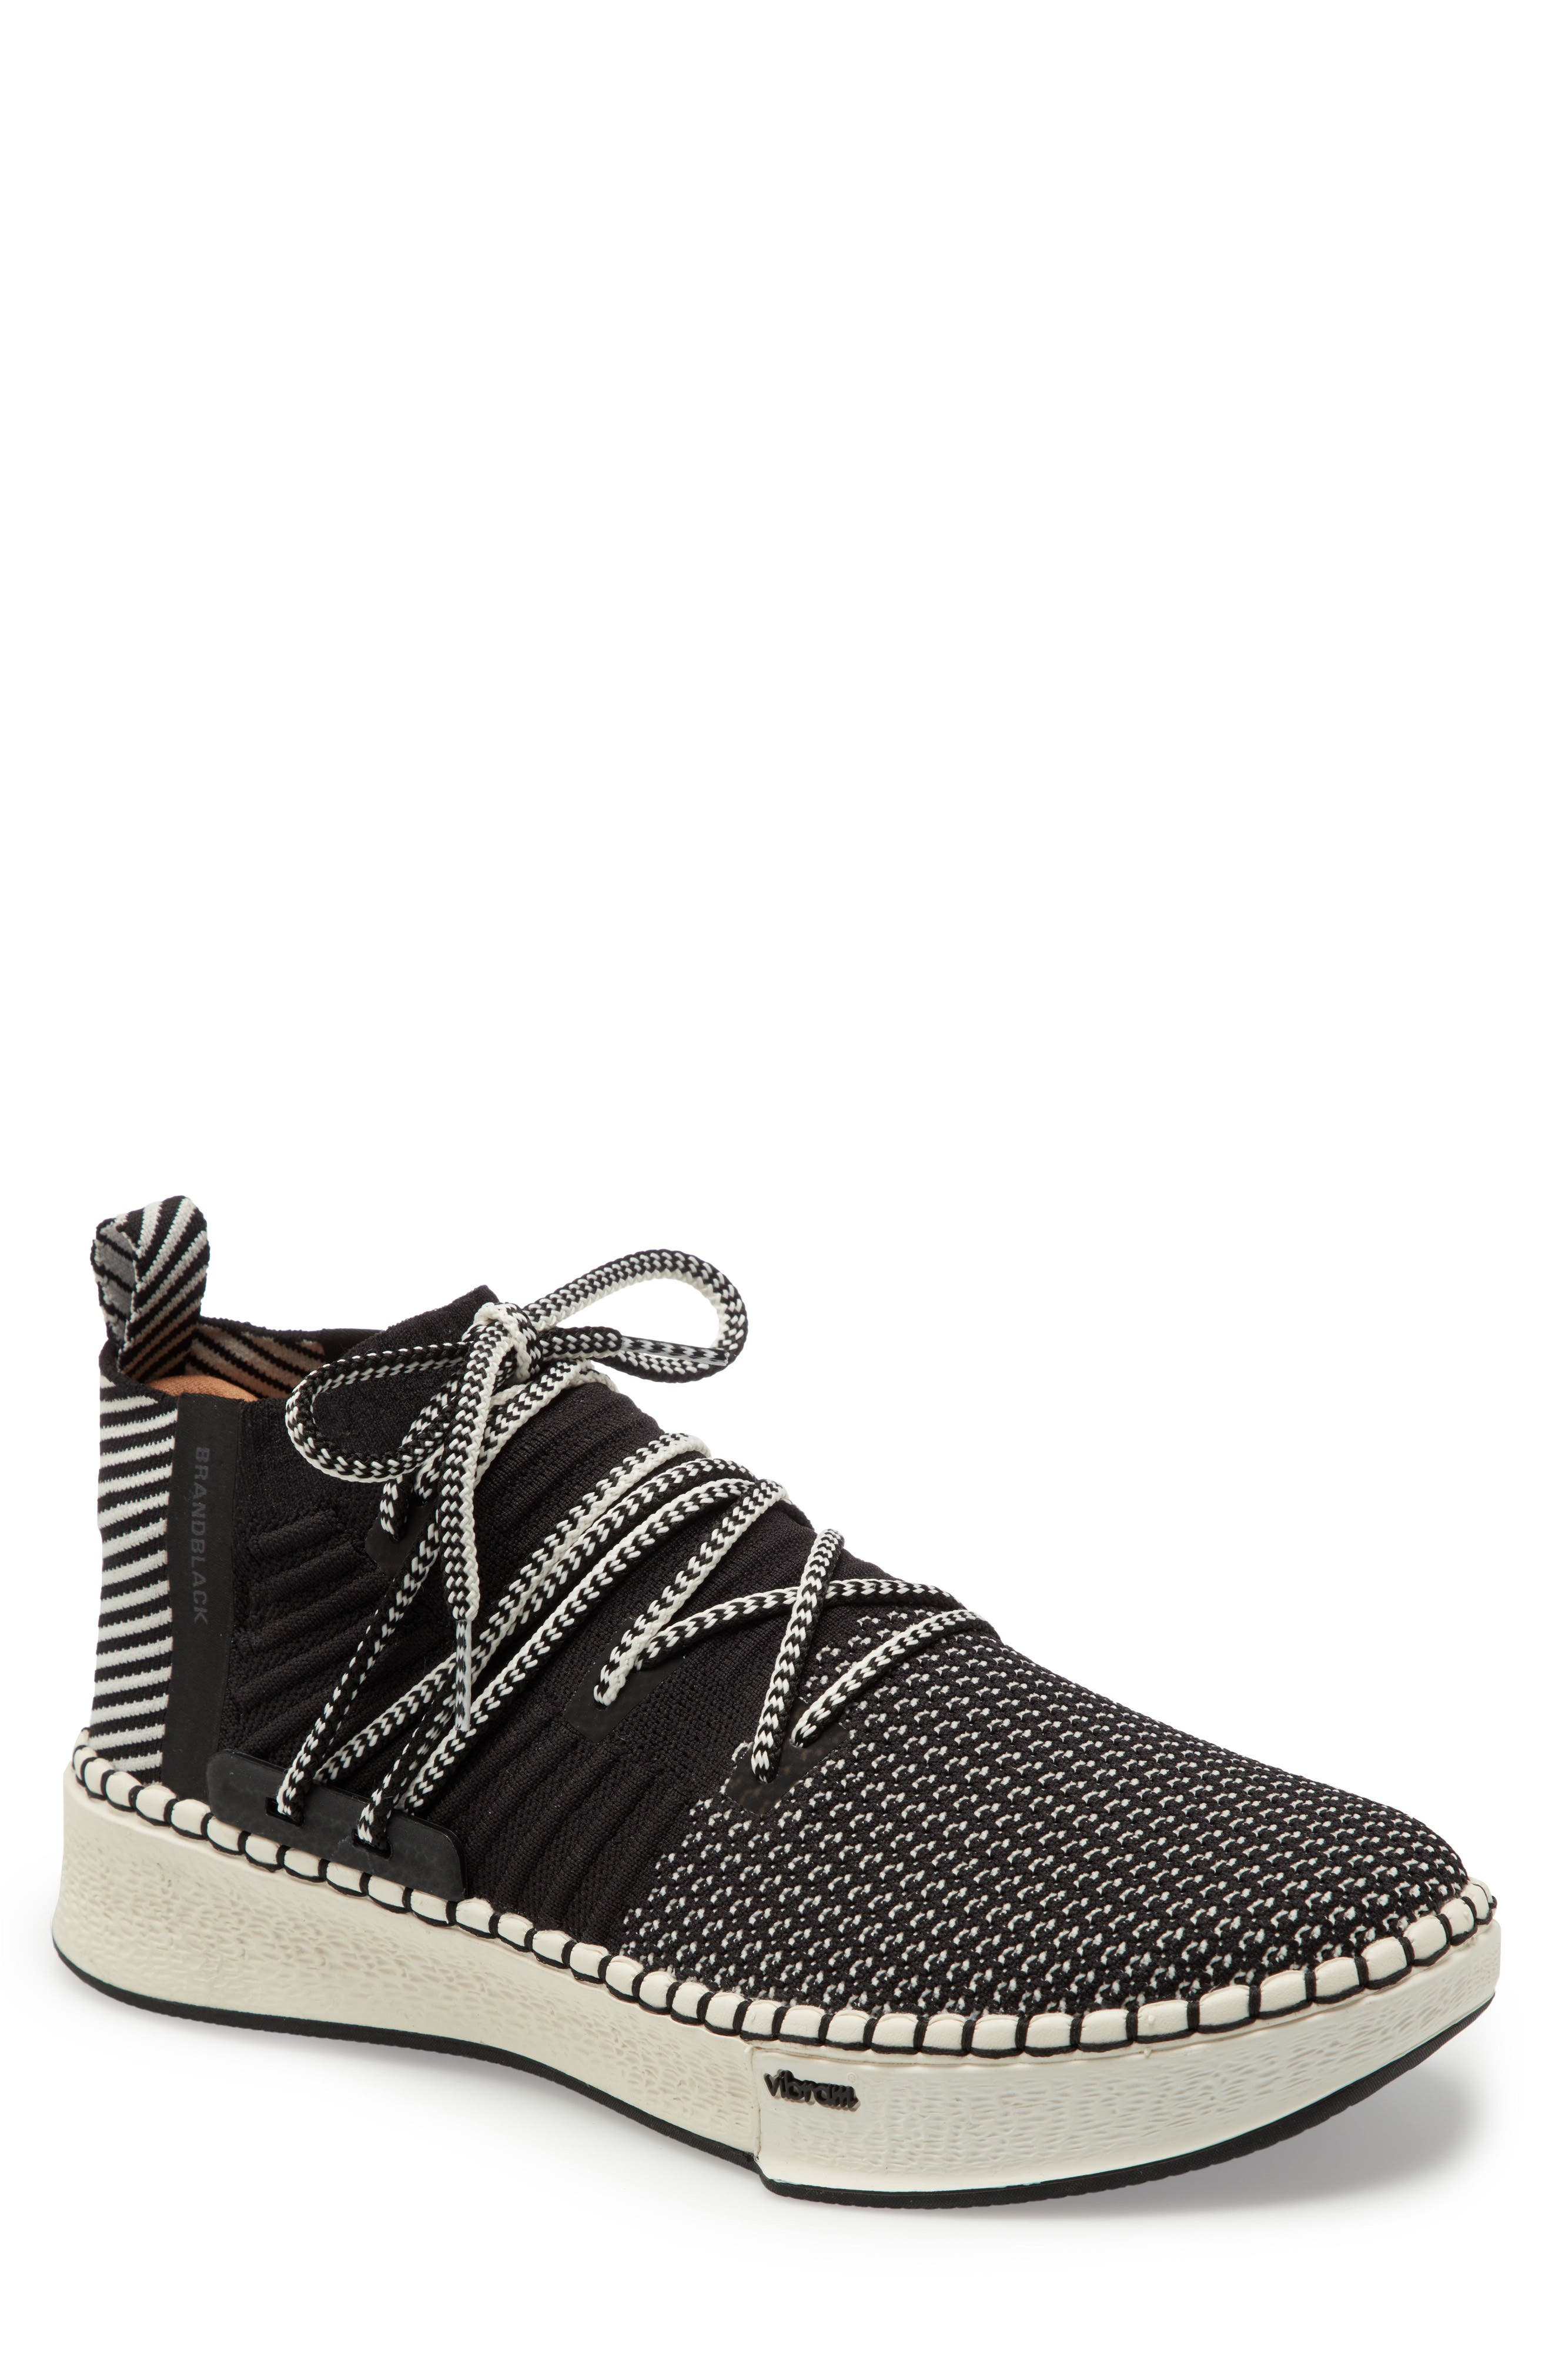 Delta Sneaker,                             Main thumbnail 1, color,